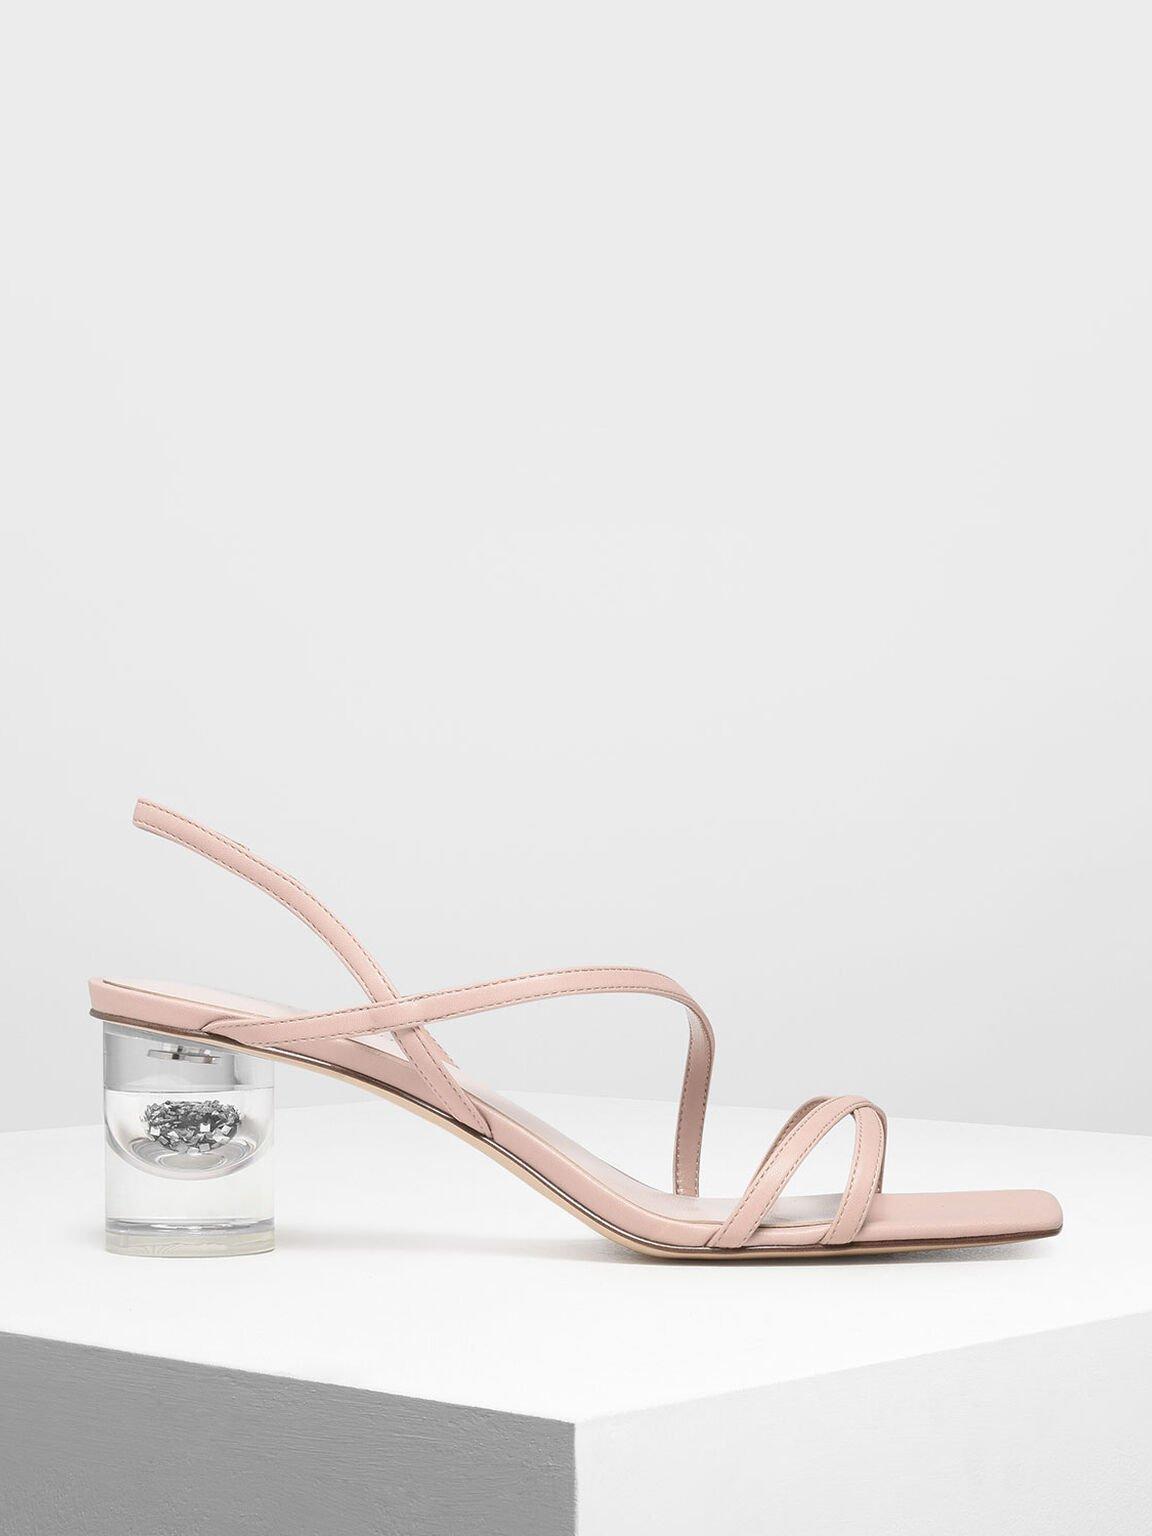 Asymmetric Strap Lucite Heel Sandals, Nude, hi-res